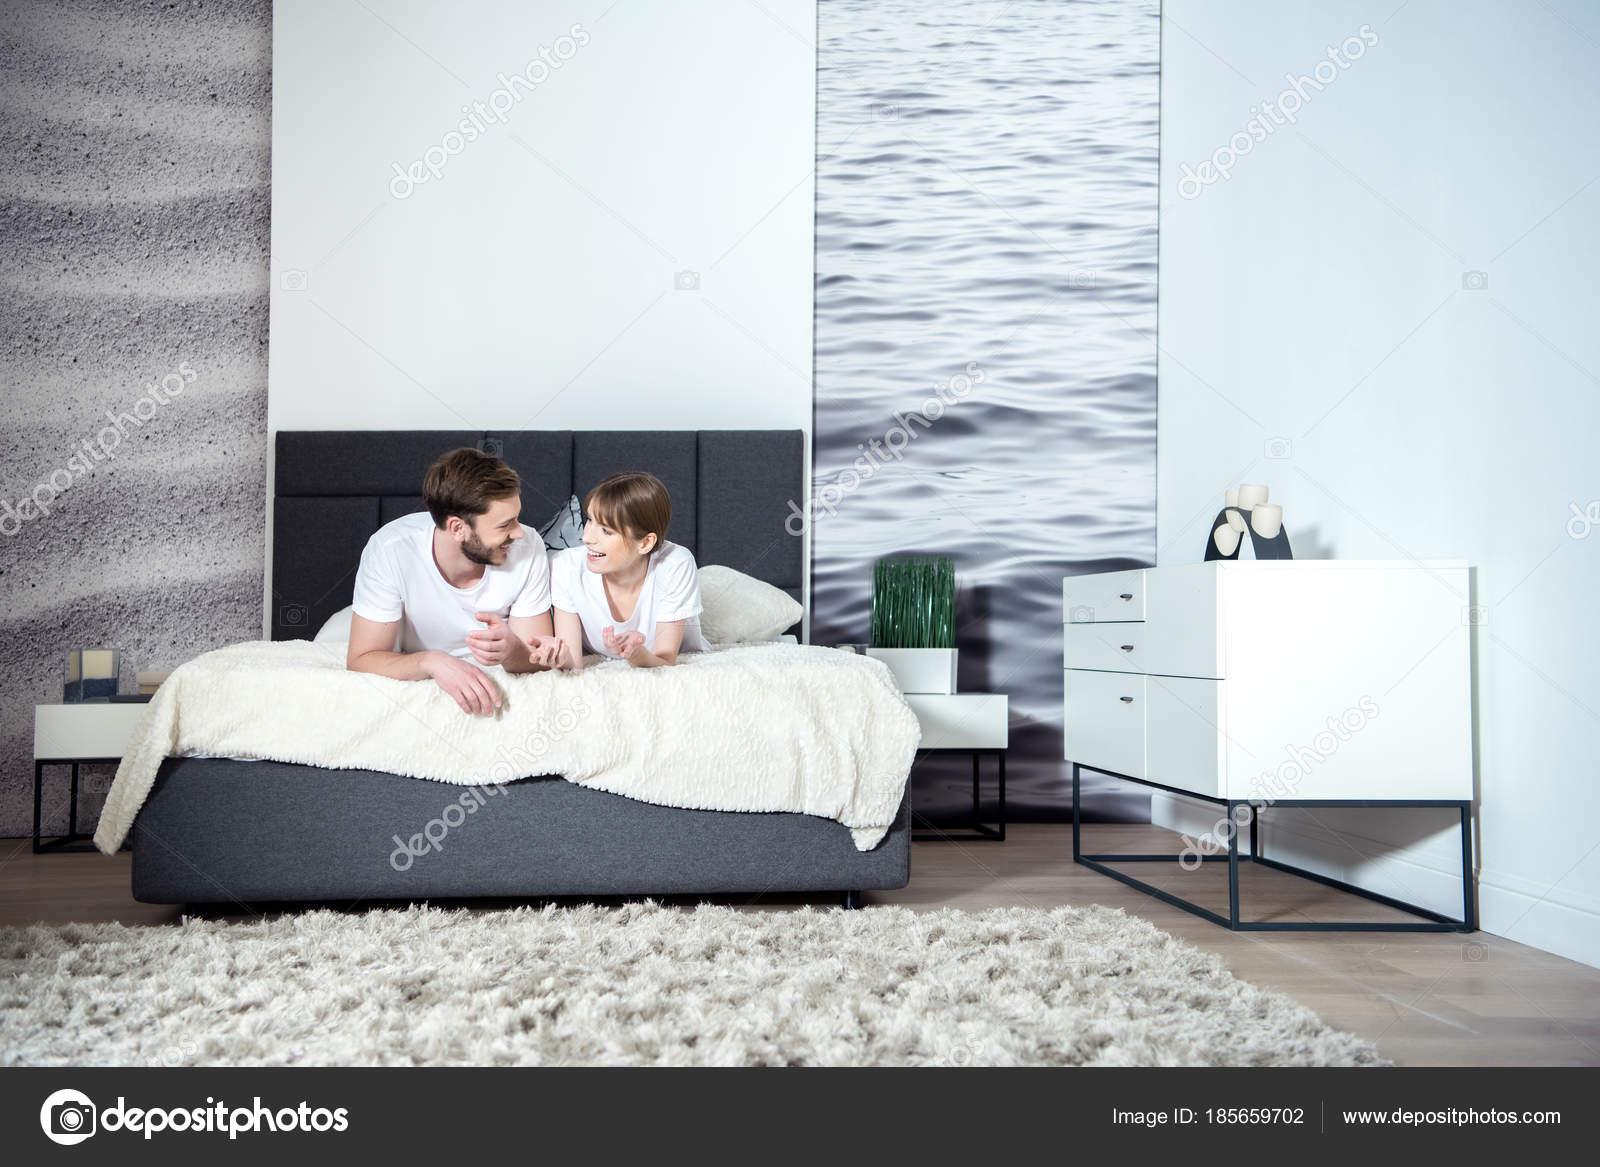 Lachende paar praten liggend bed gezellige slaapkamer met modern